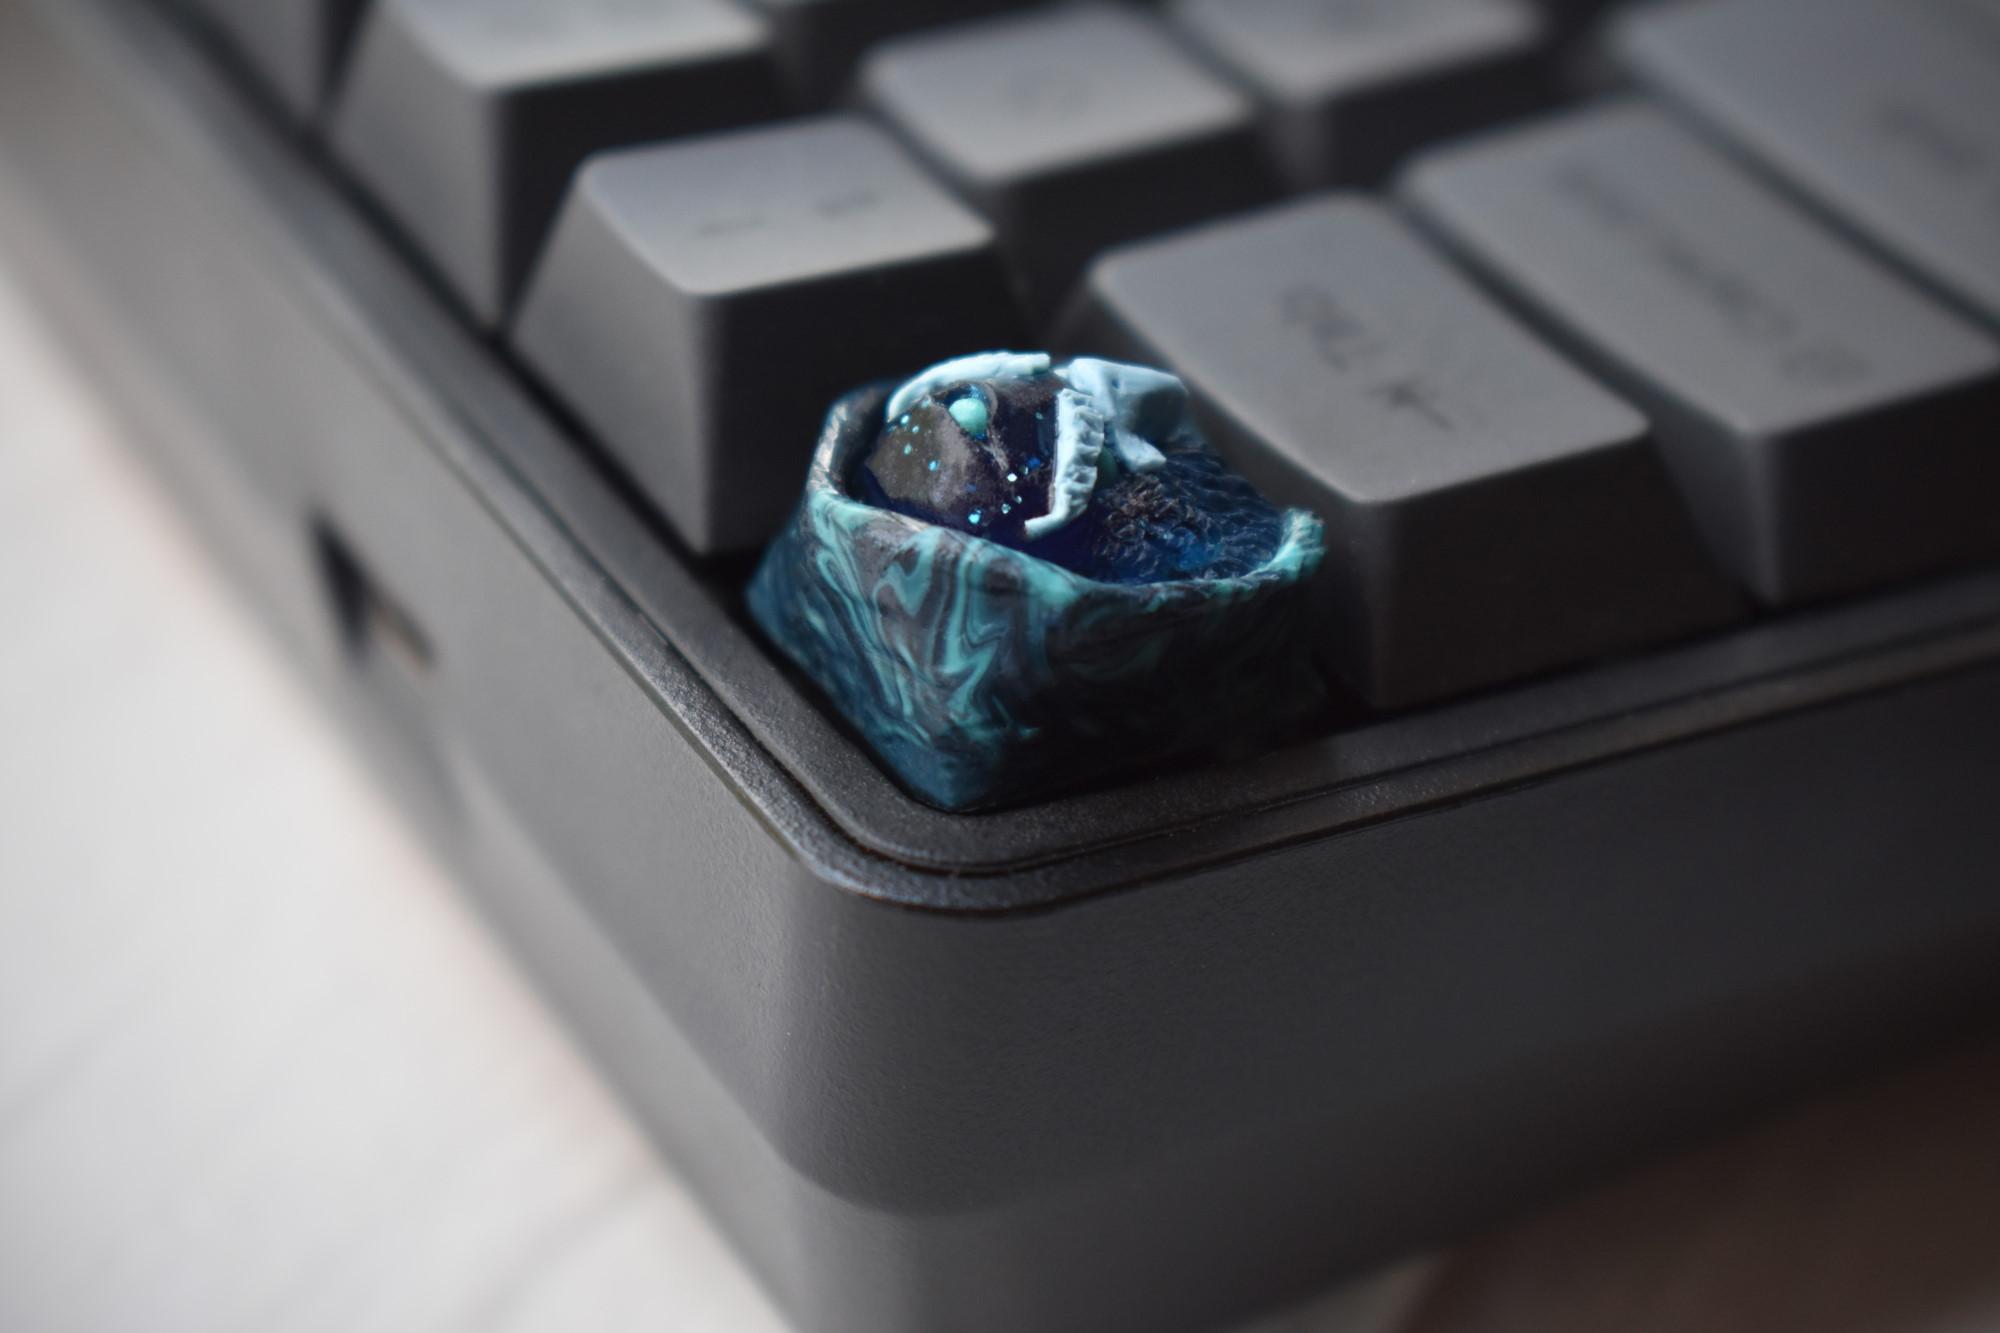 KeyLabs Hammerhead Artisans